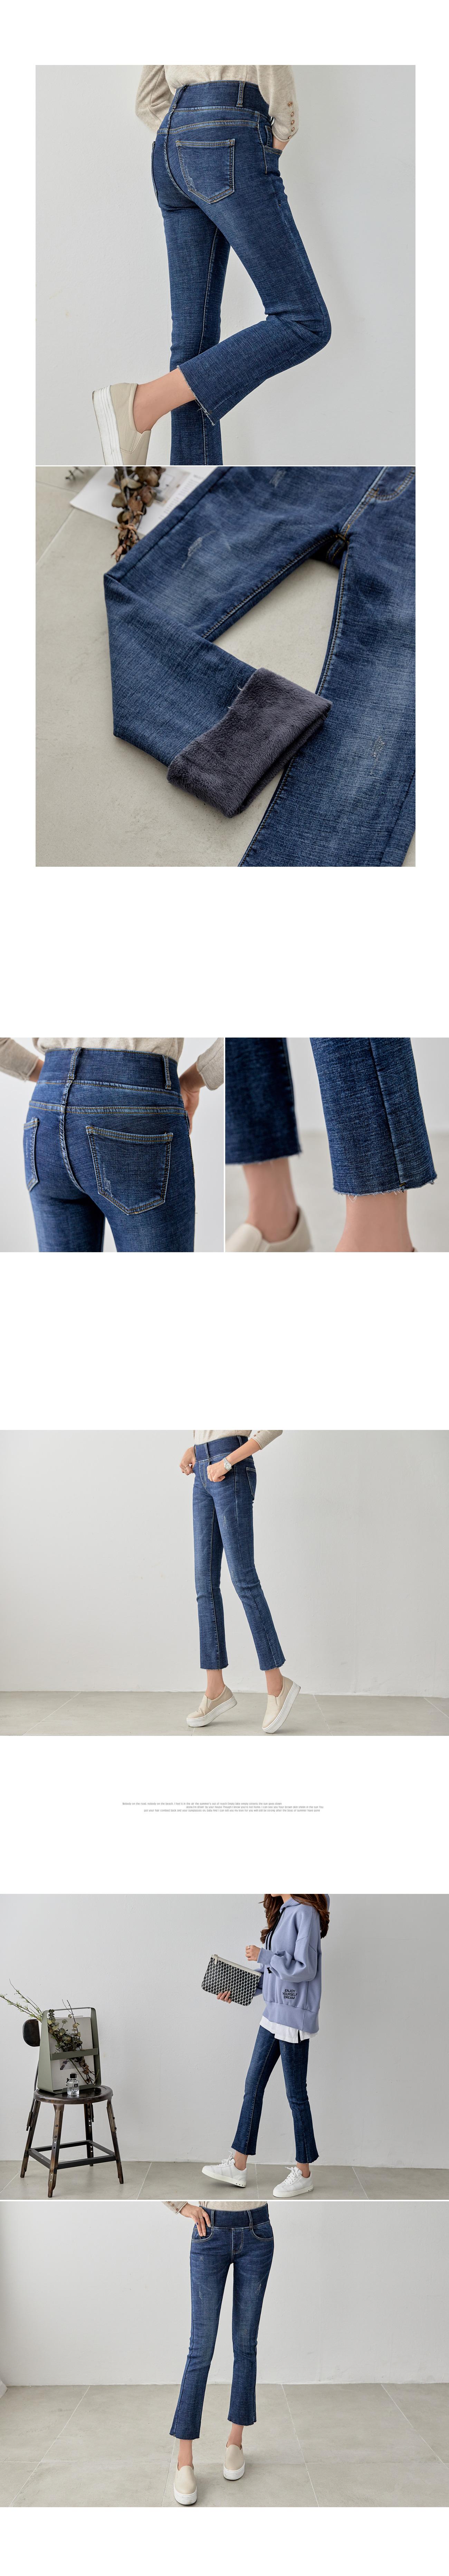 Poop-Up Raised Flared Jeans #75519